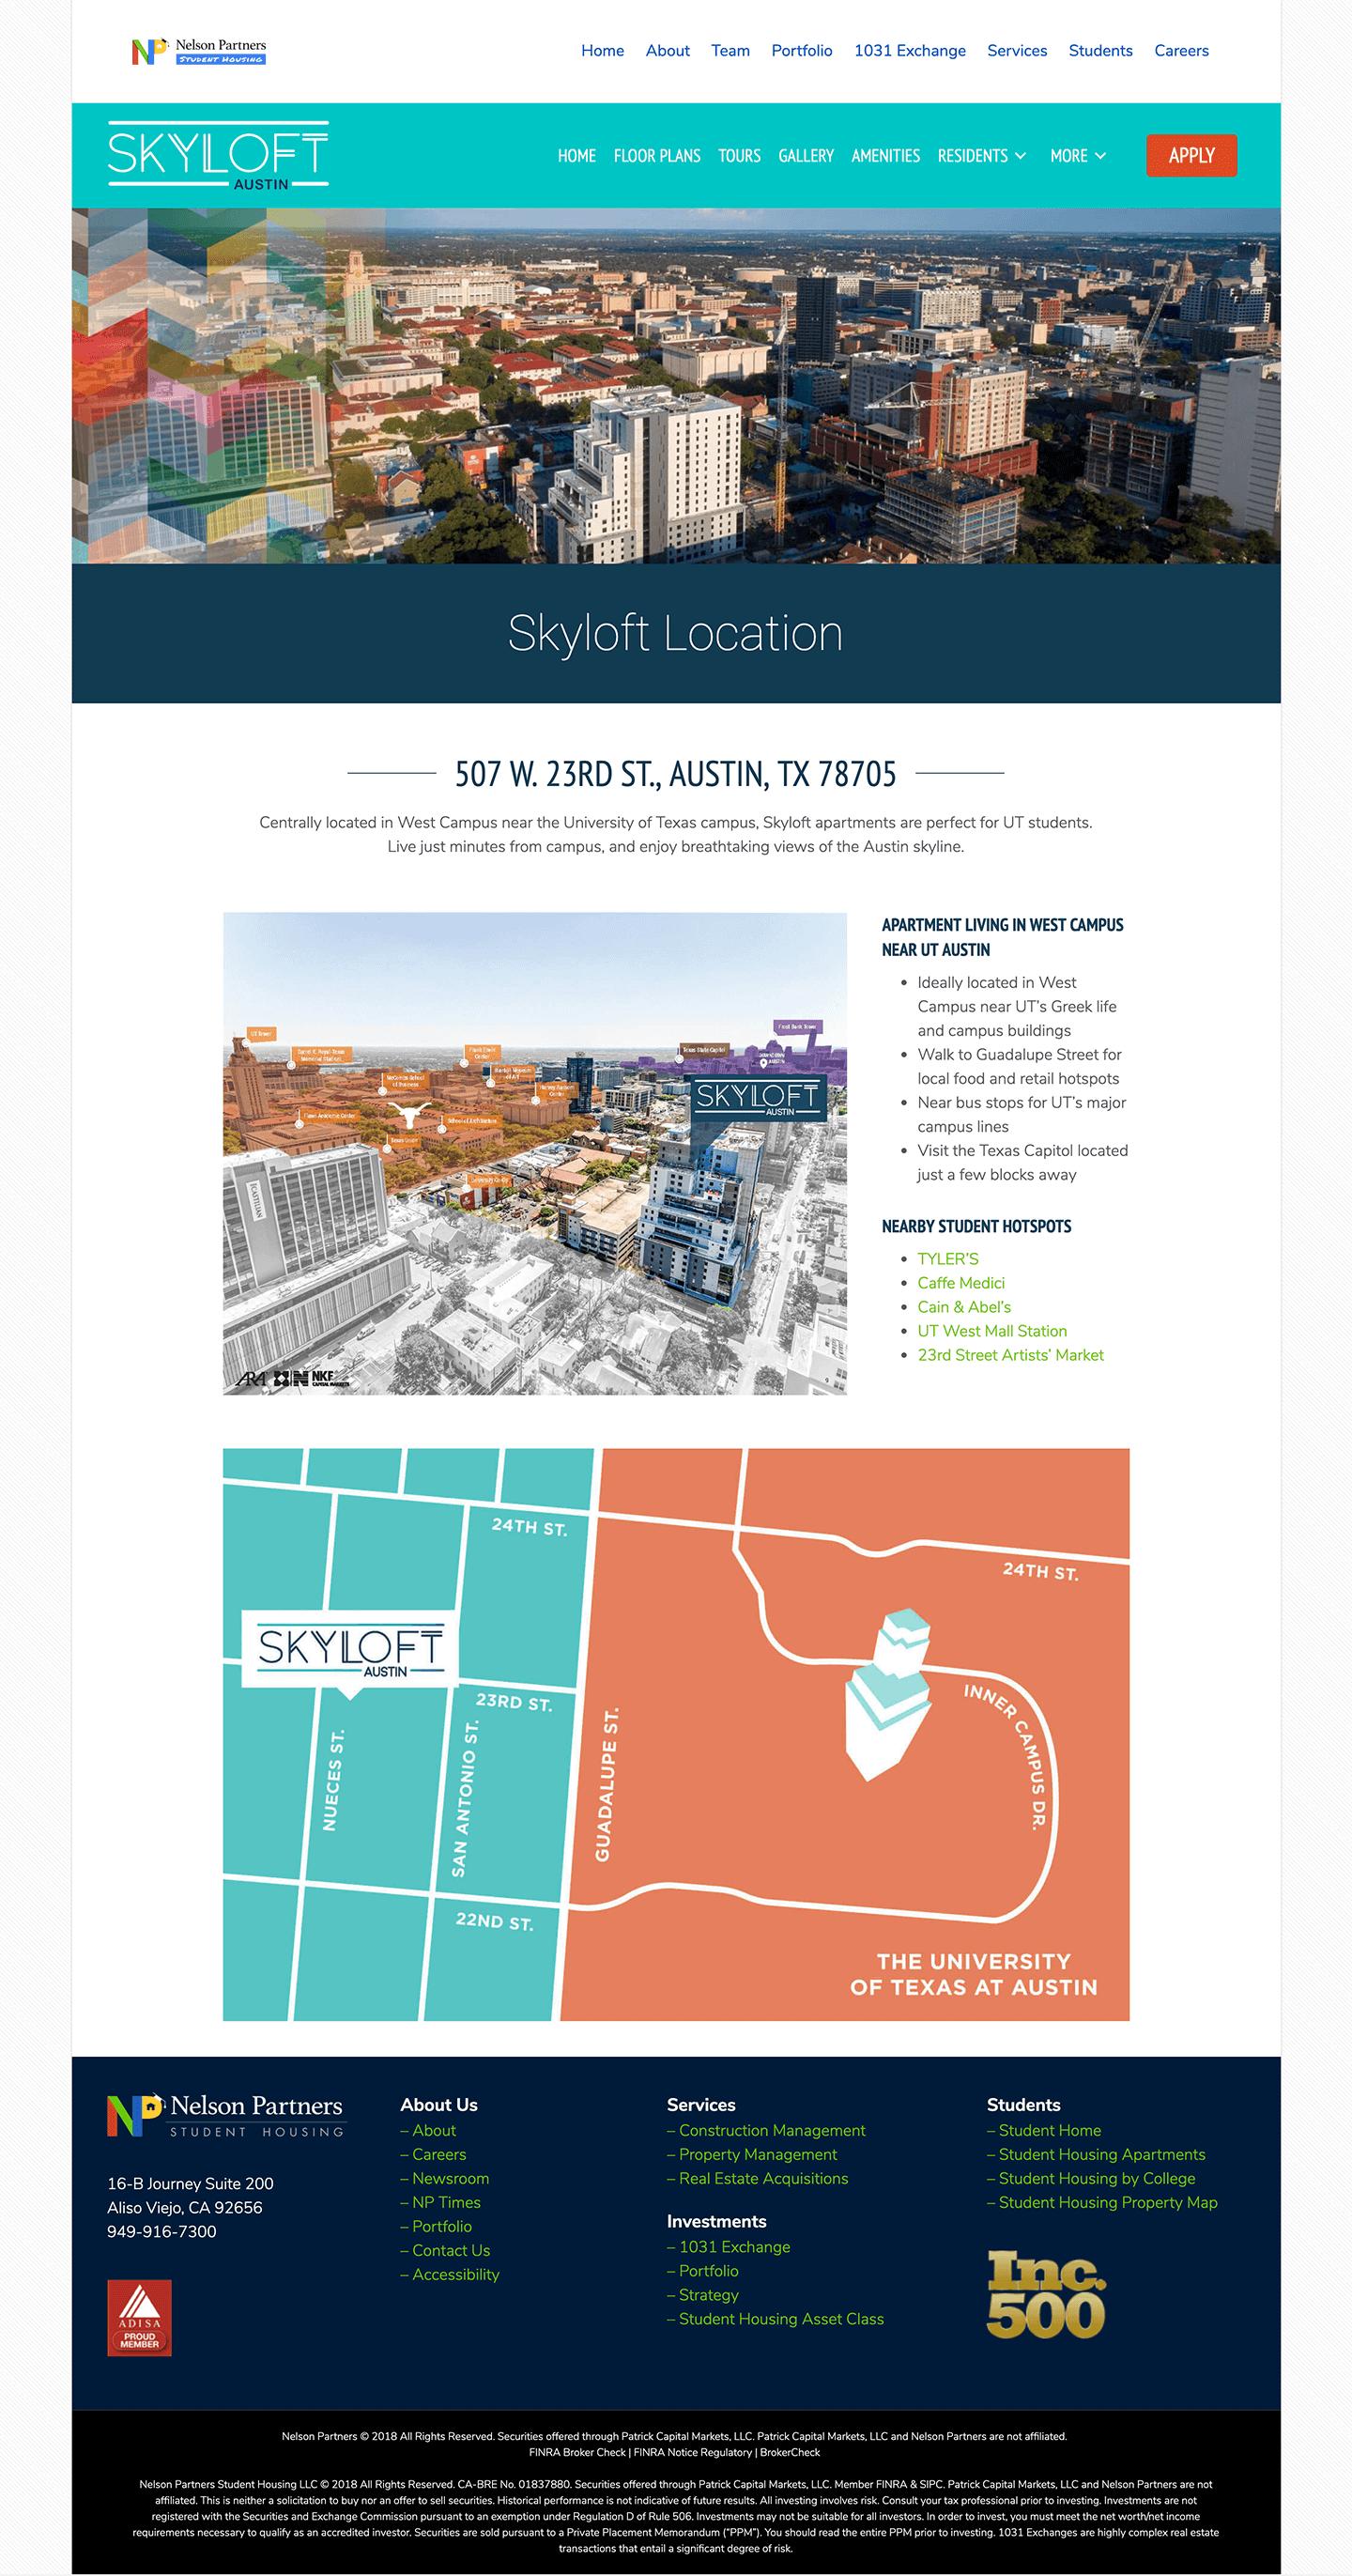 Skyloft-Student-Housing-Apartments-Website-Design-Location-Page